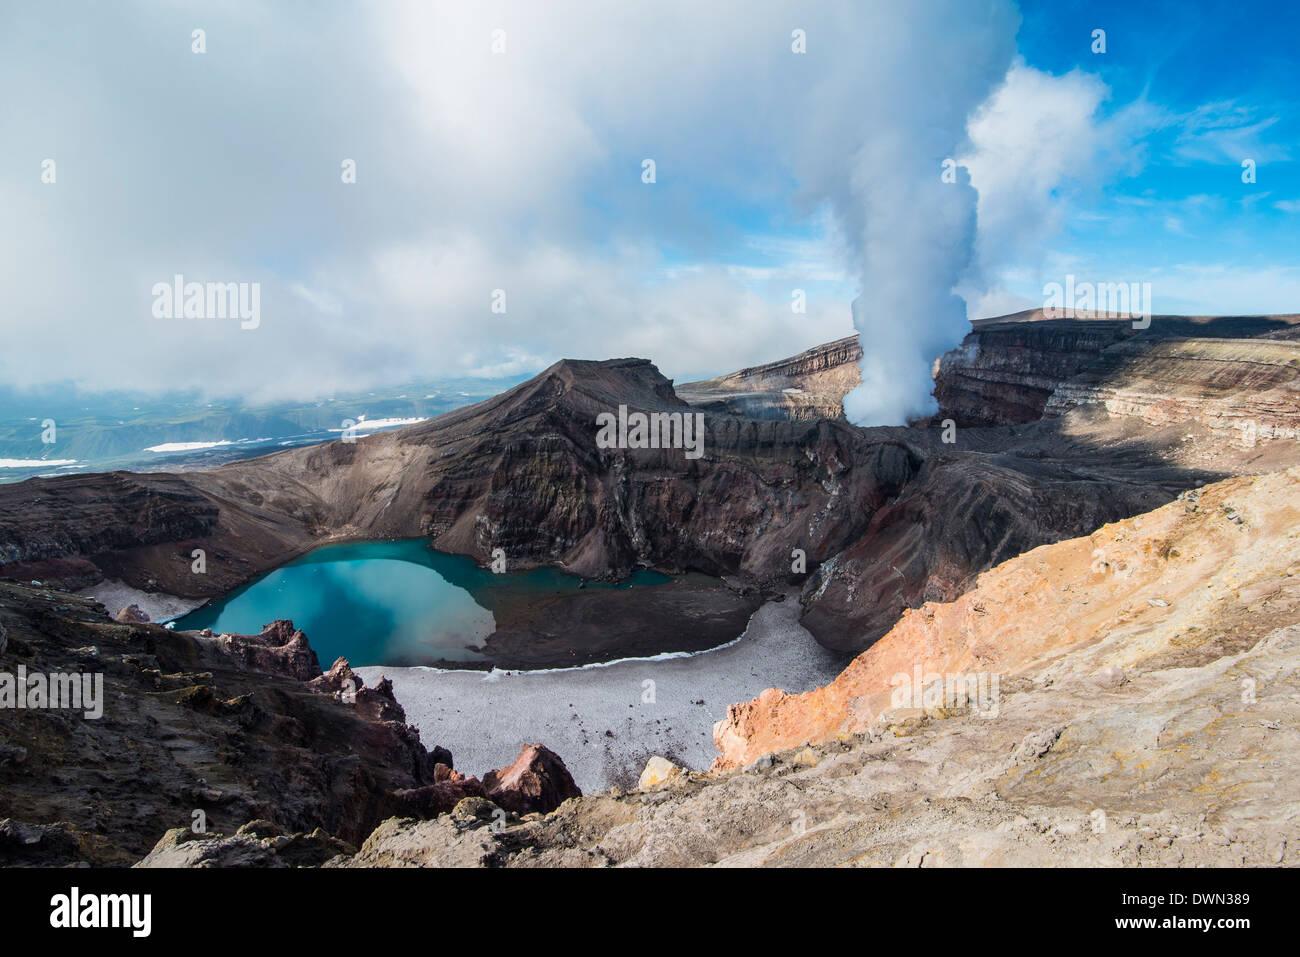 Dampfenden Fumarole auf der Gorely Vulkan, Kamtschatka, Russland, Eurasien Stockbild